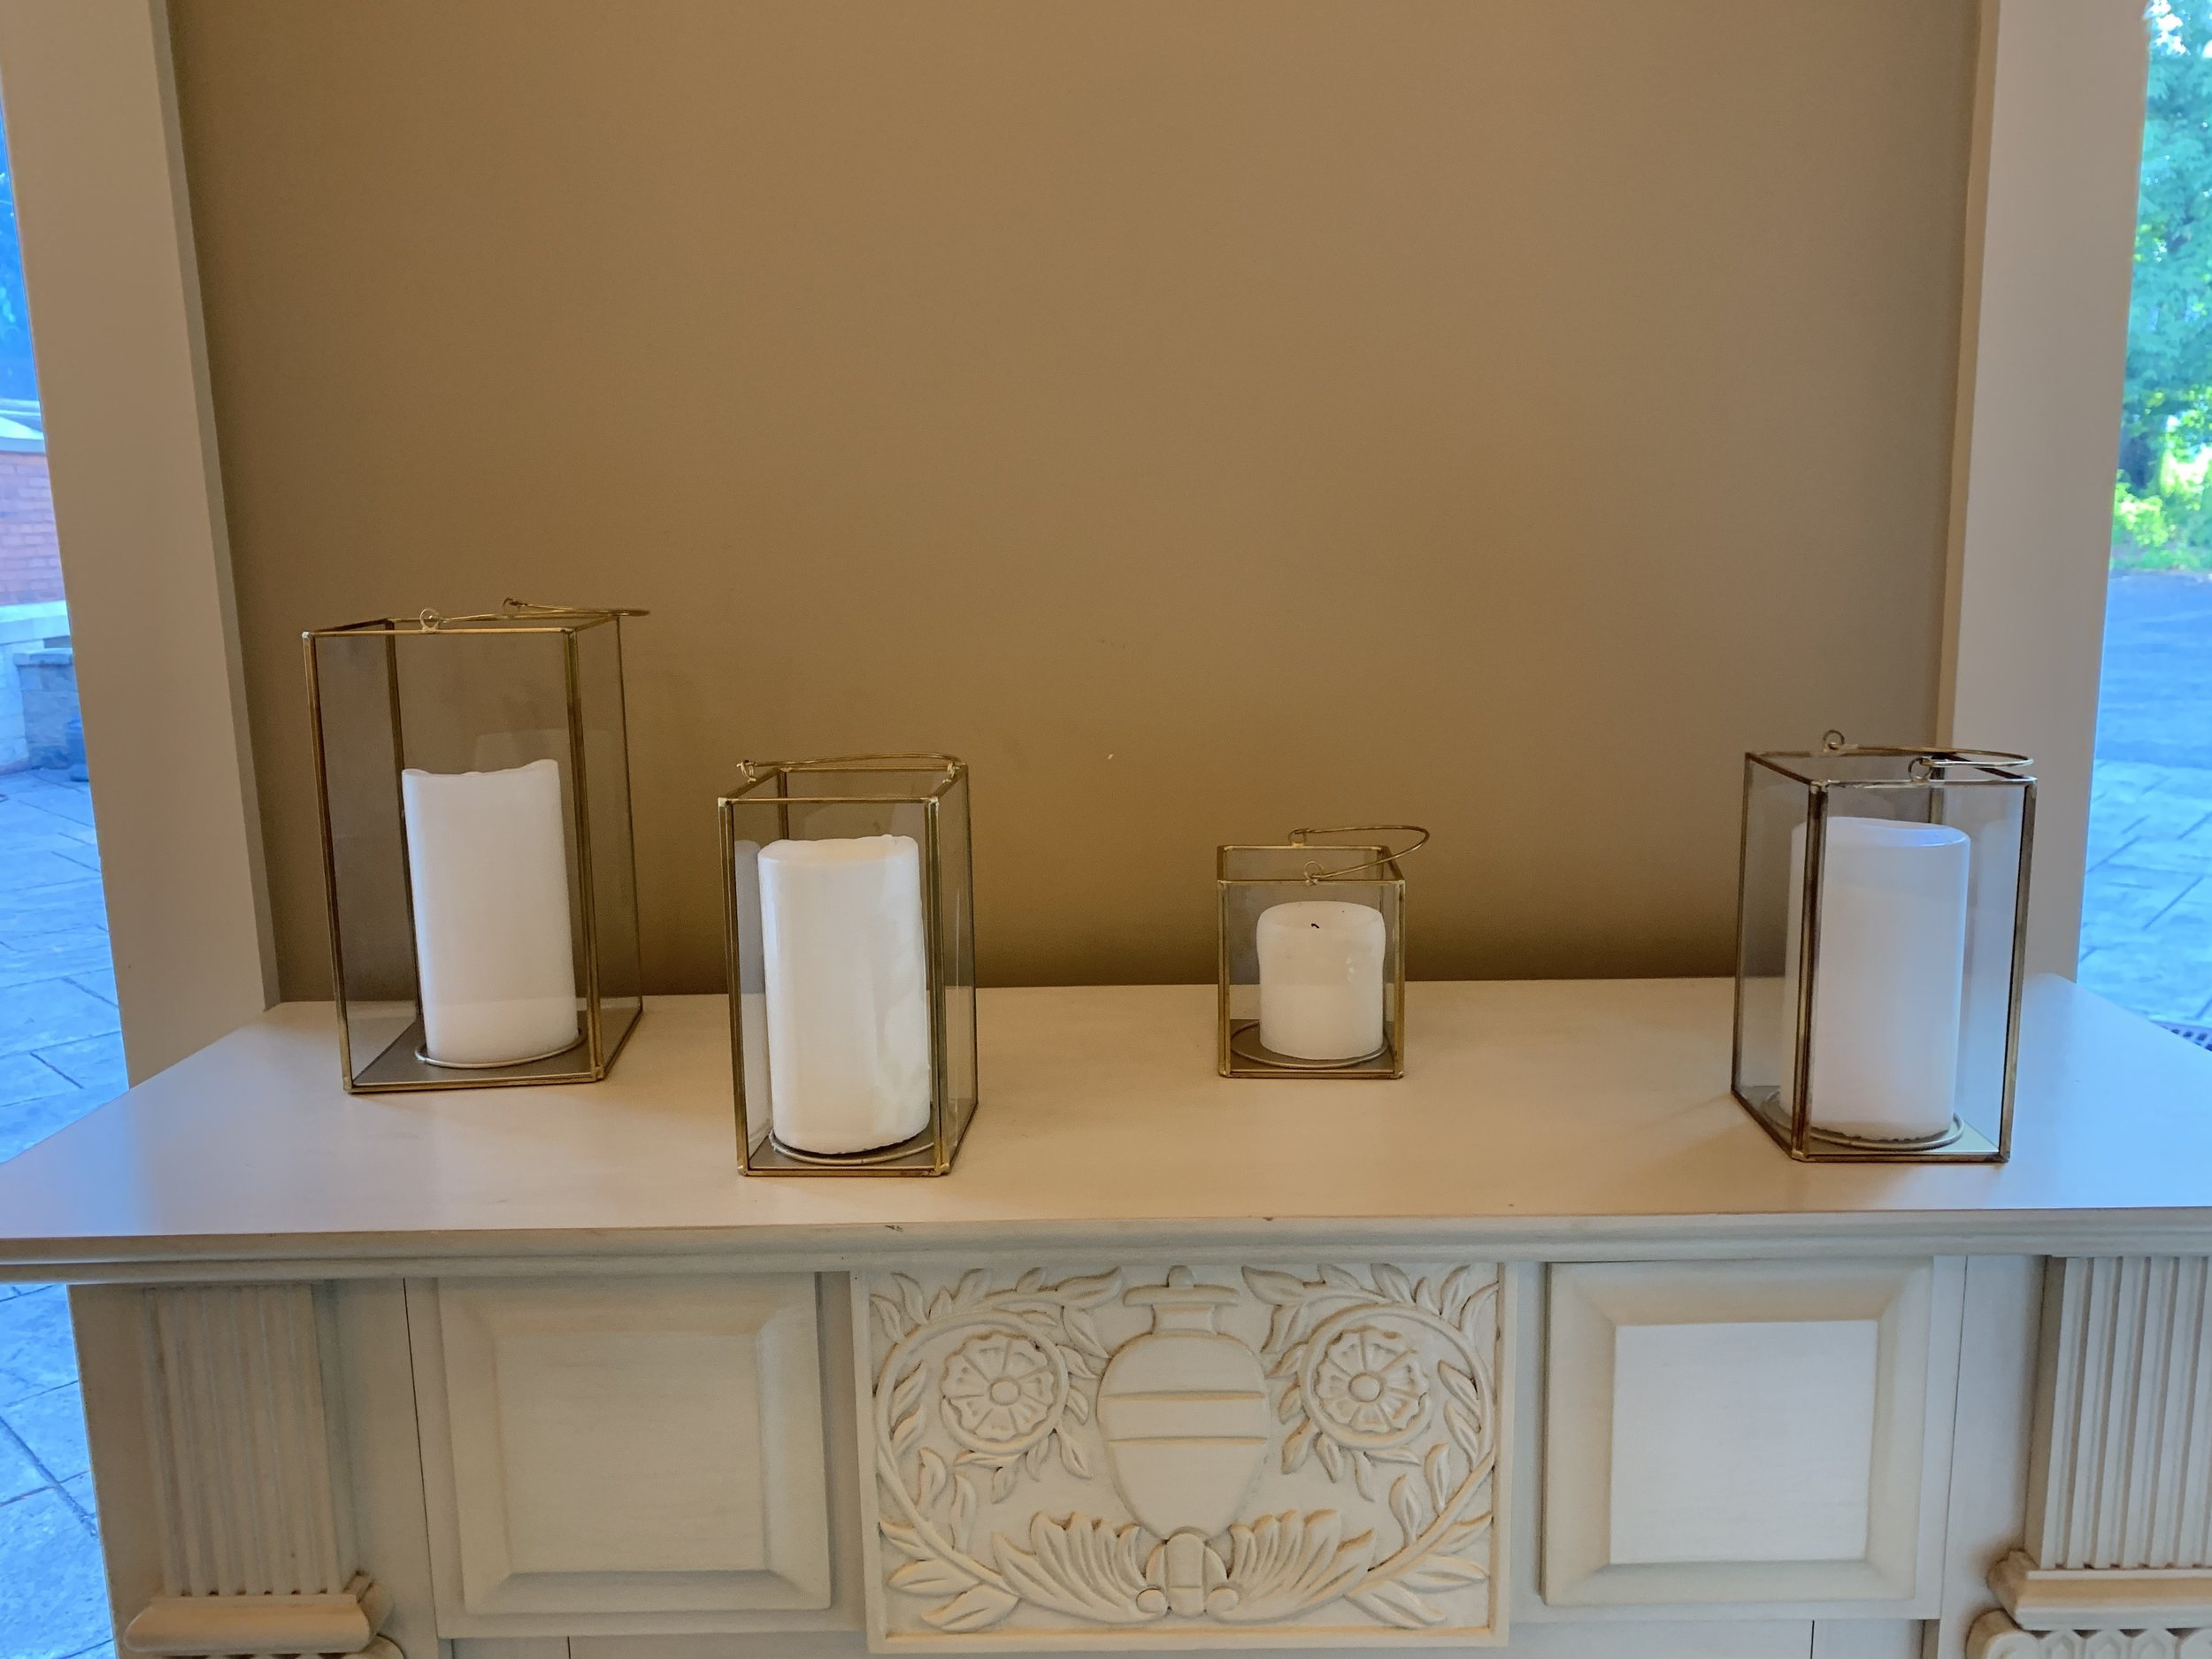 4 various-sized gold rimmed lanterns